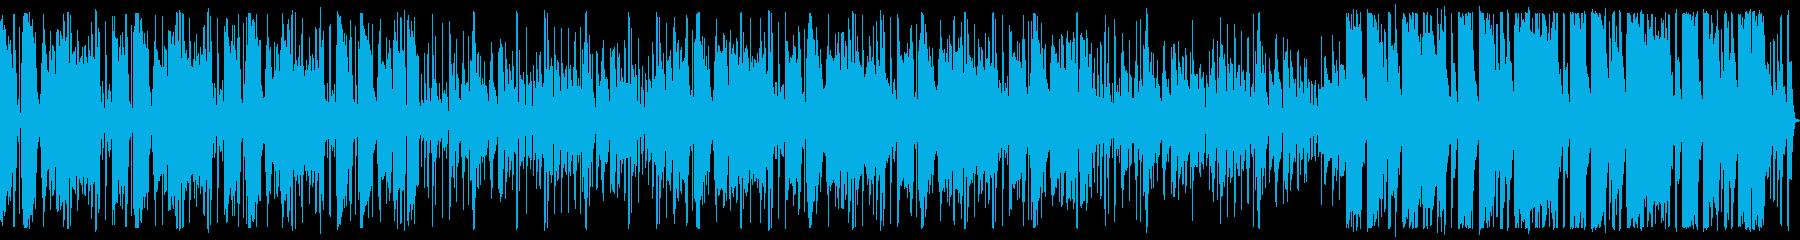 KANTスリリングリズム130_3の再生済みの波形